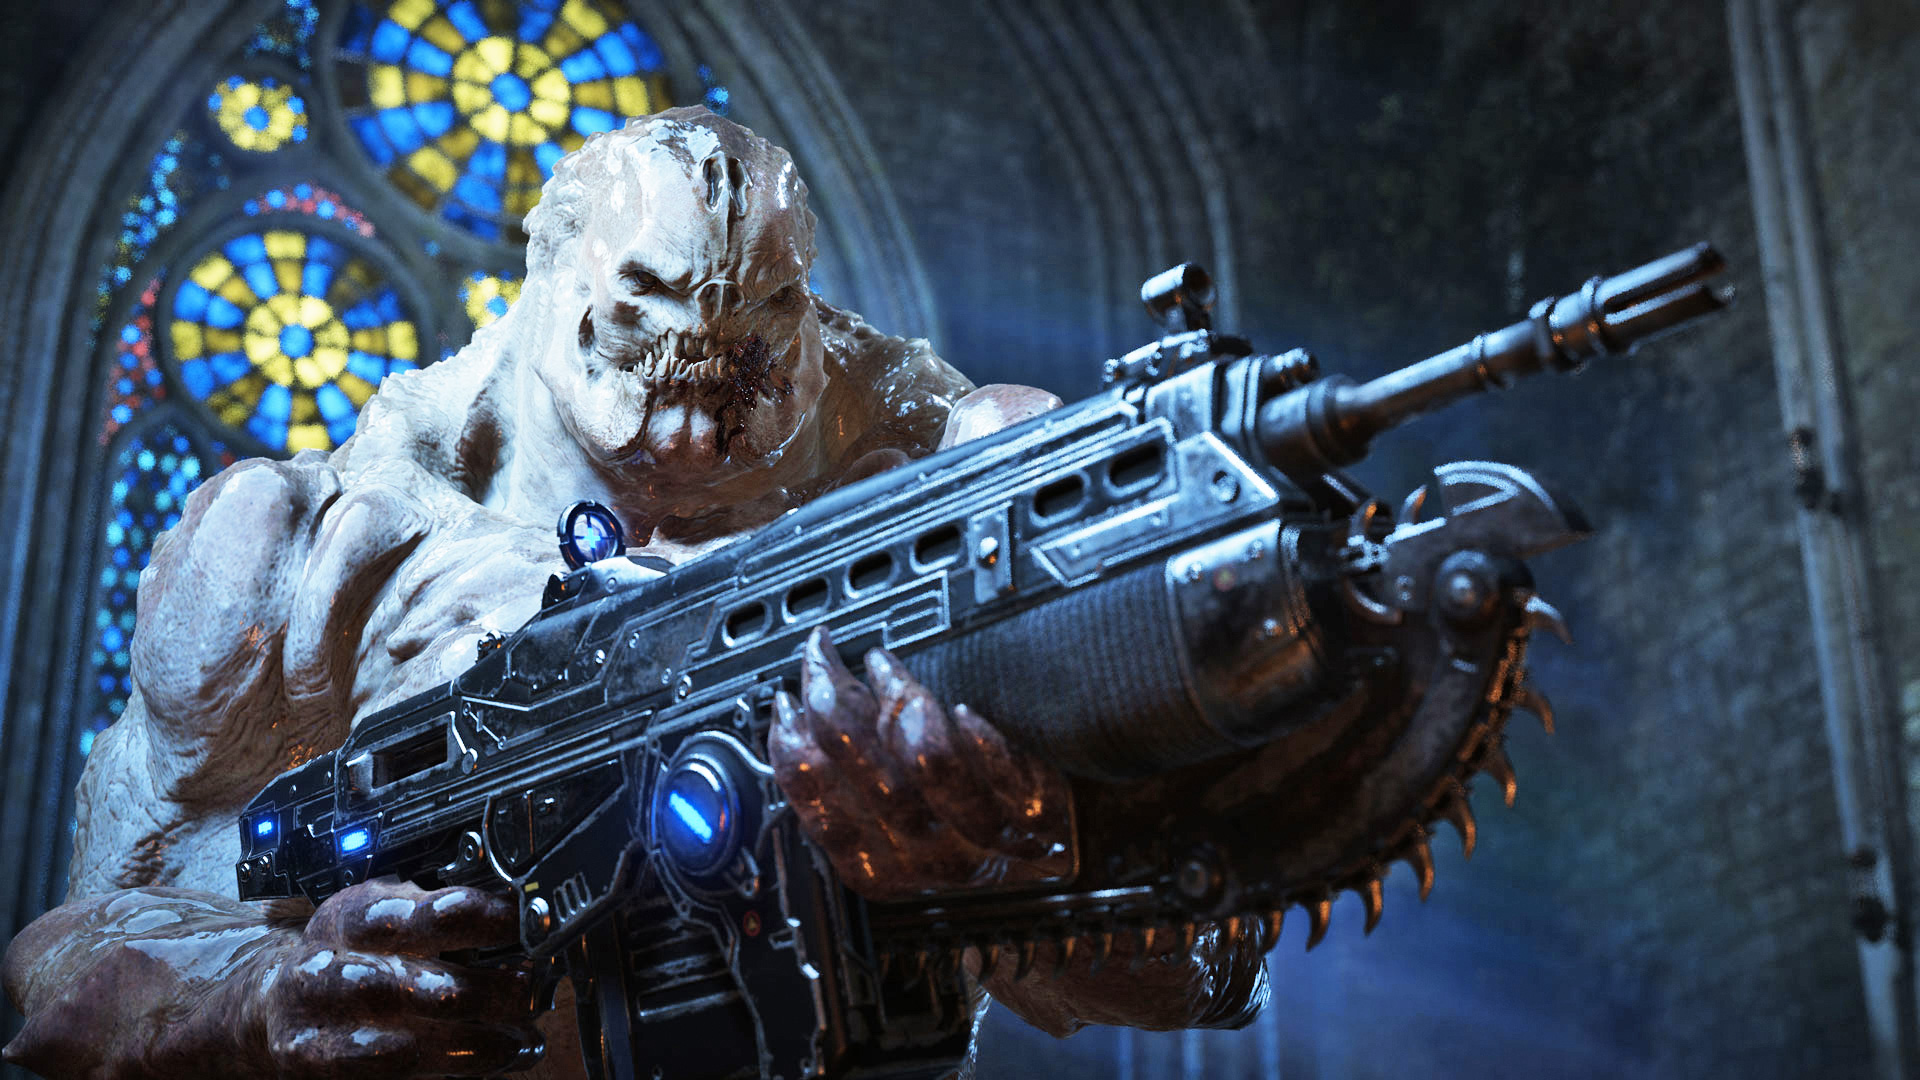 جزئیات بهروزرسان جدید Gears of War 4